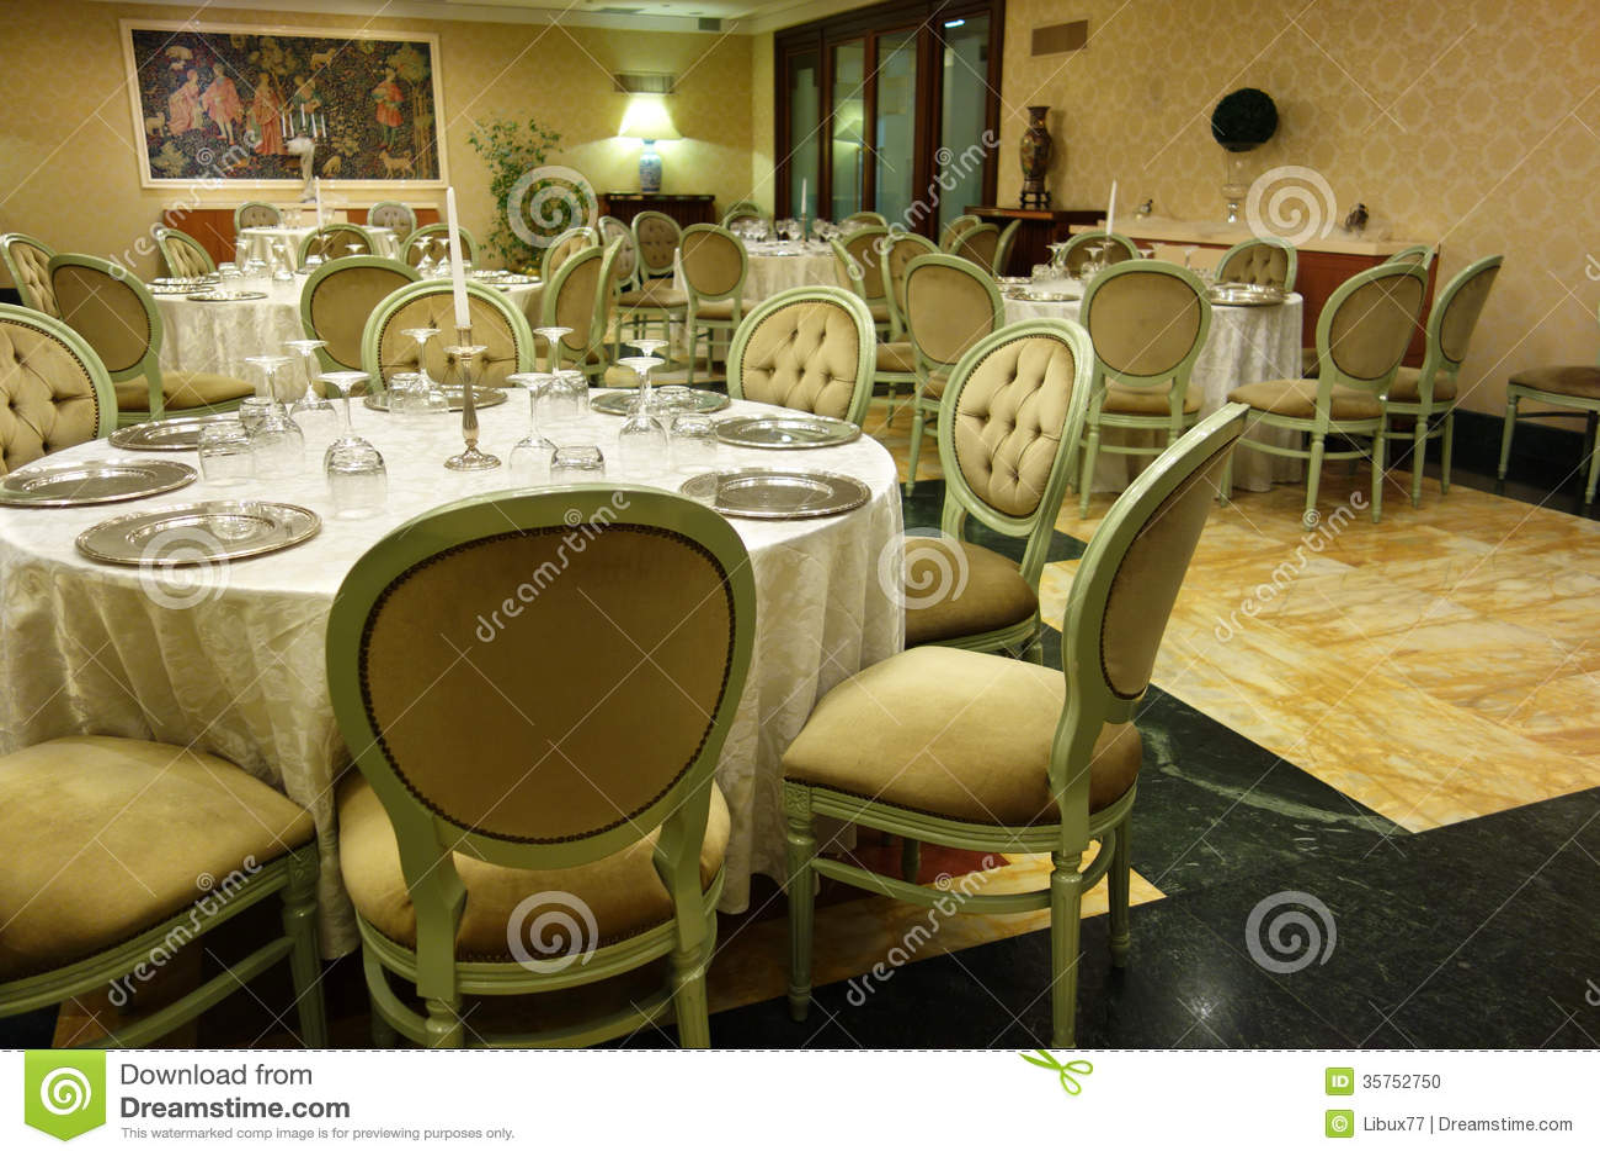 Classical Ceremony Reception Venue